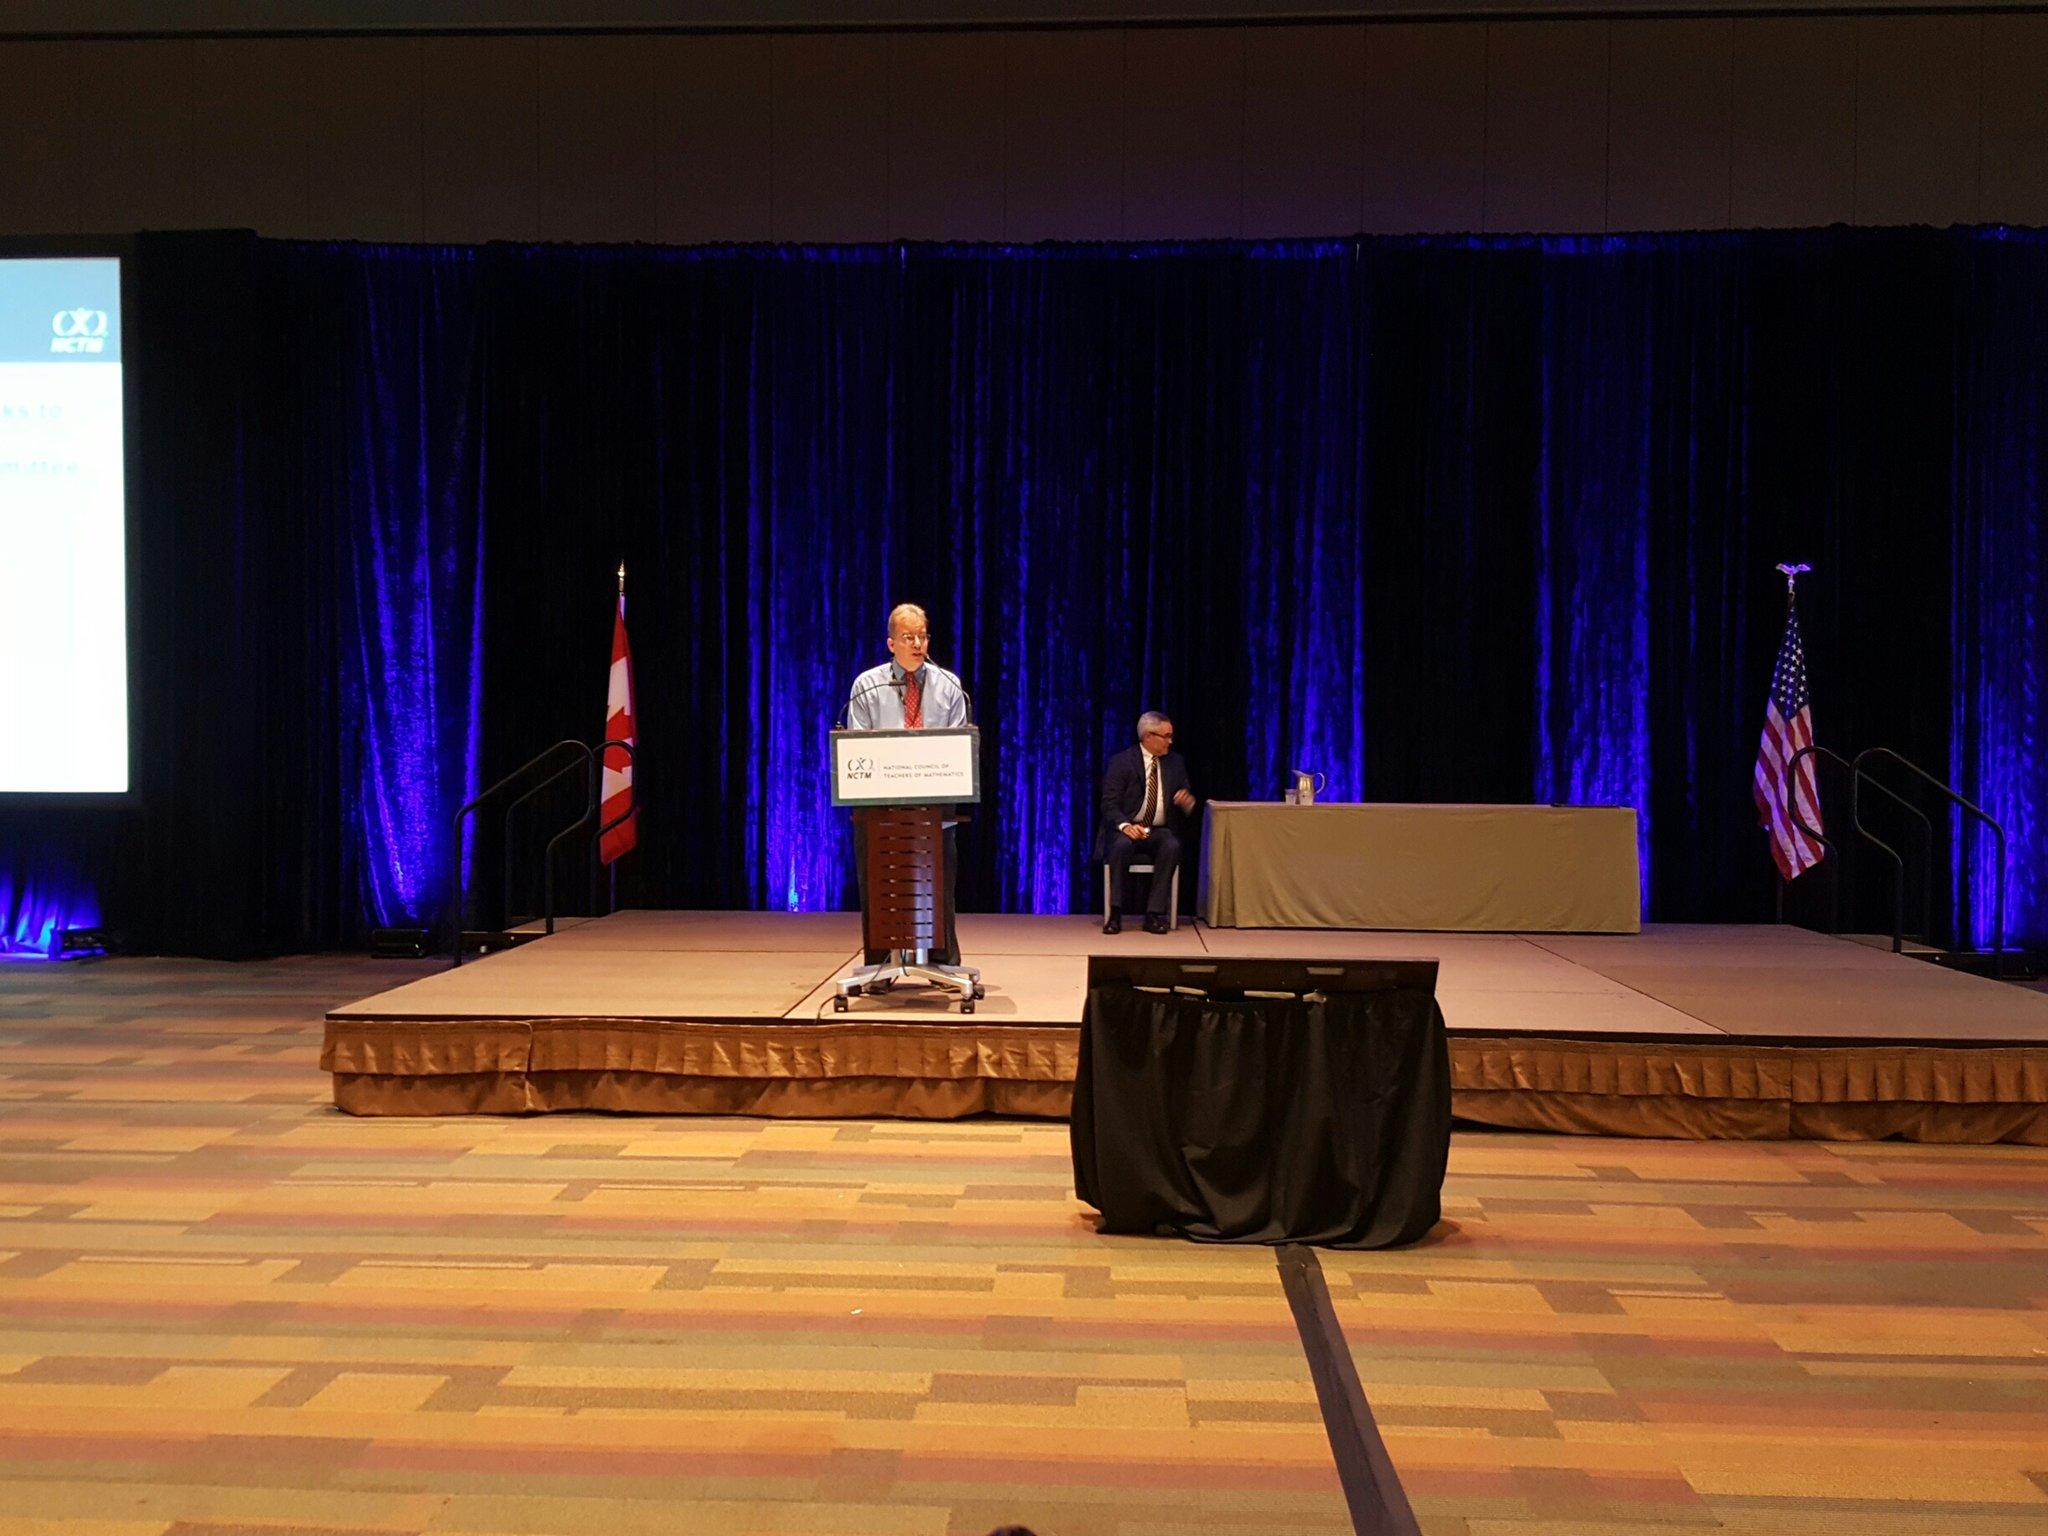 @BrianBeaudrie program chair #NCTMregionals https://t.co/3r0vDyX7Ij